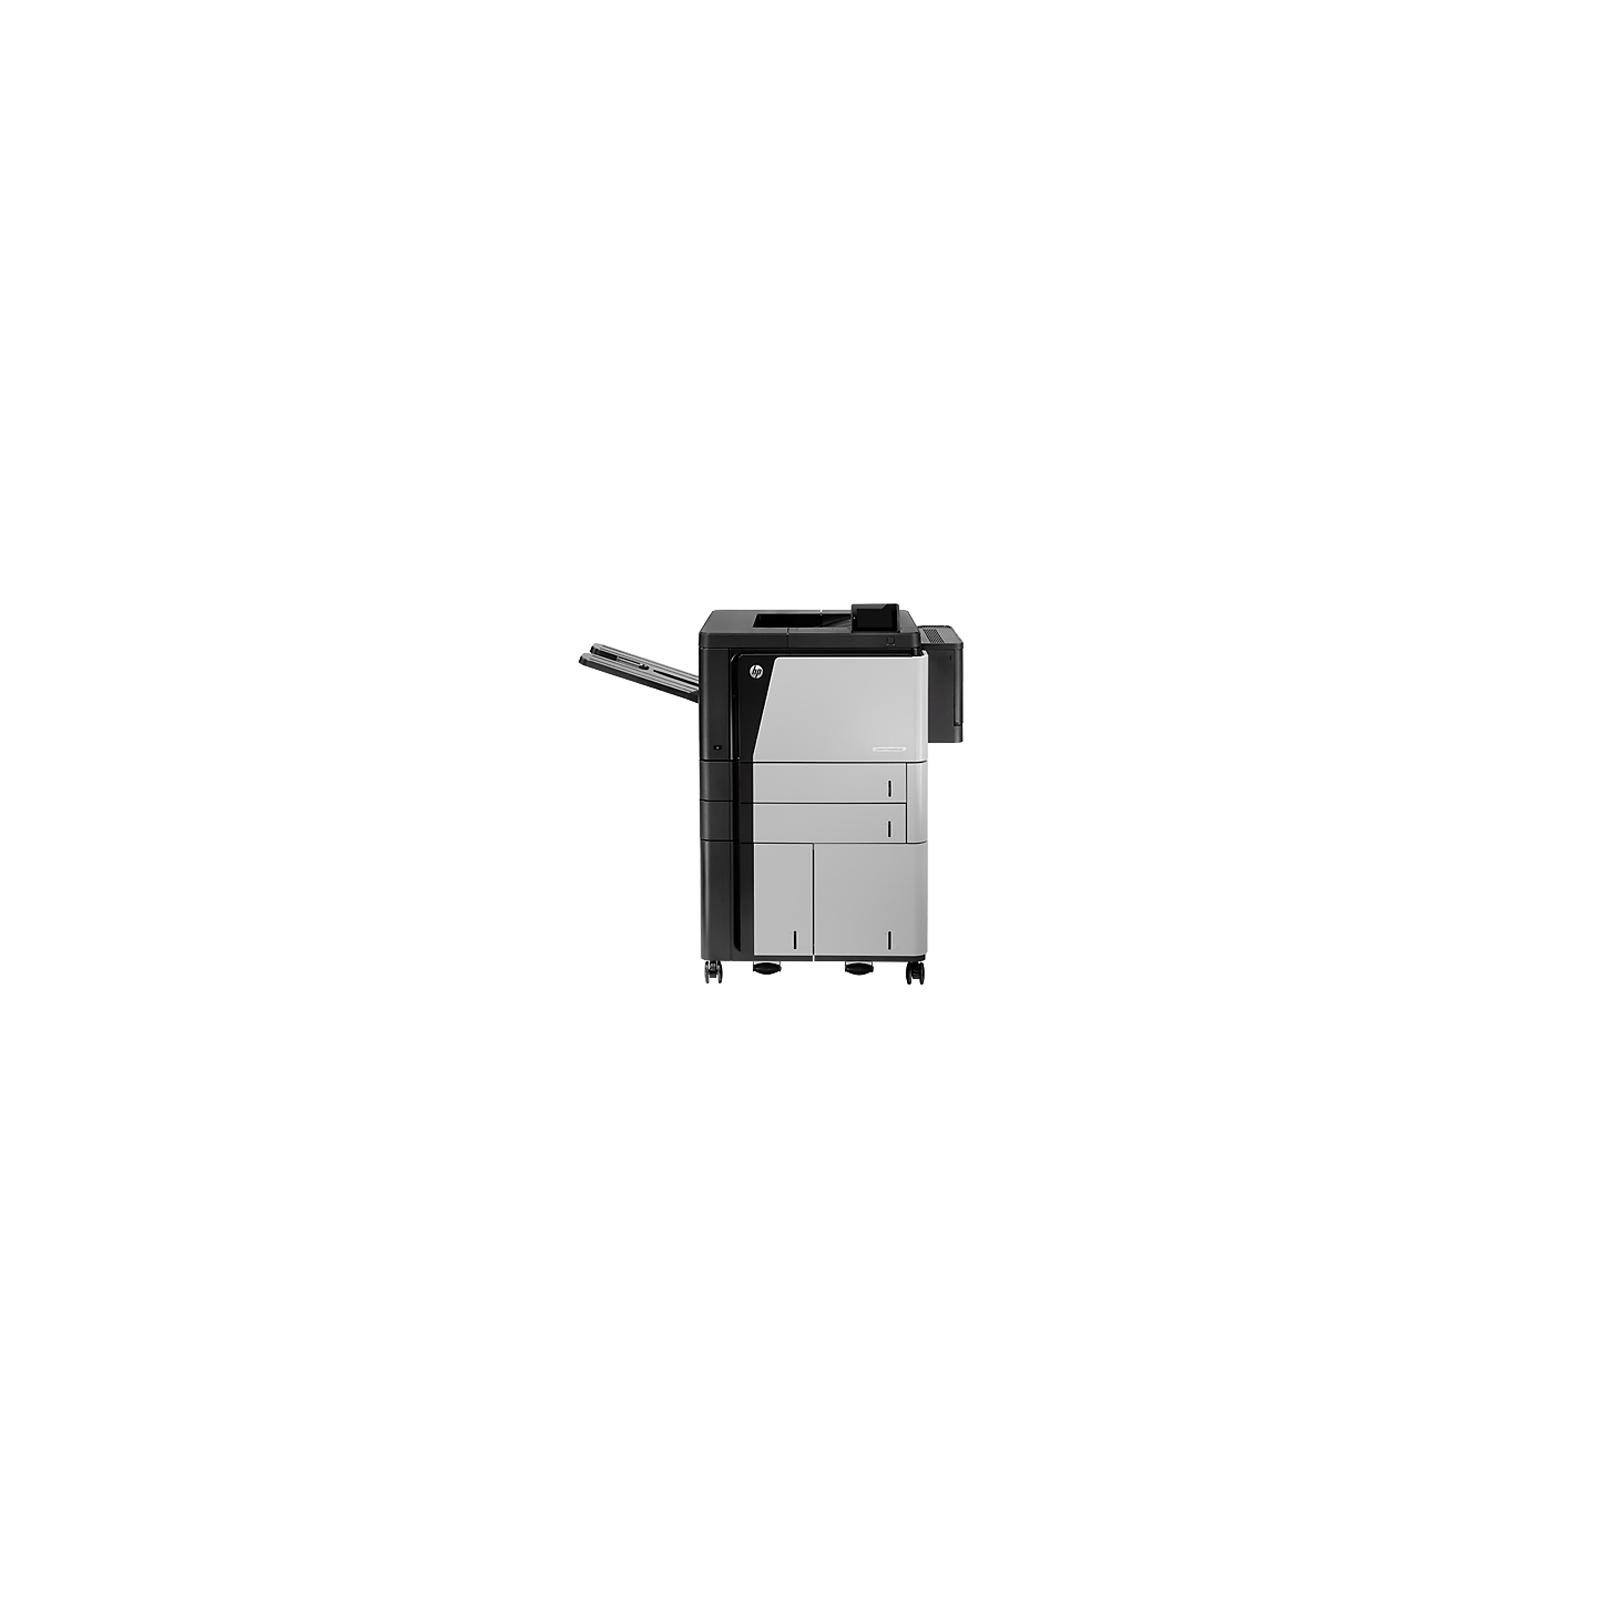 Лазерный принтер HP LaserJet Enterprise M806x+NFC (D7P69A)